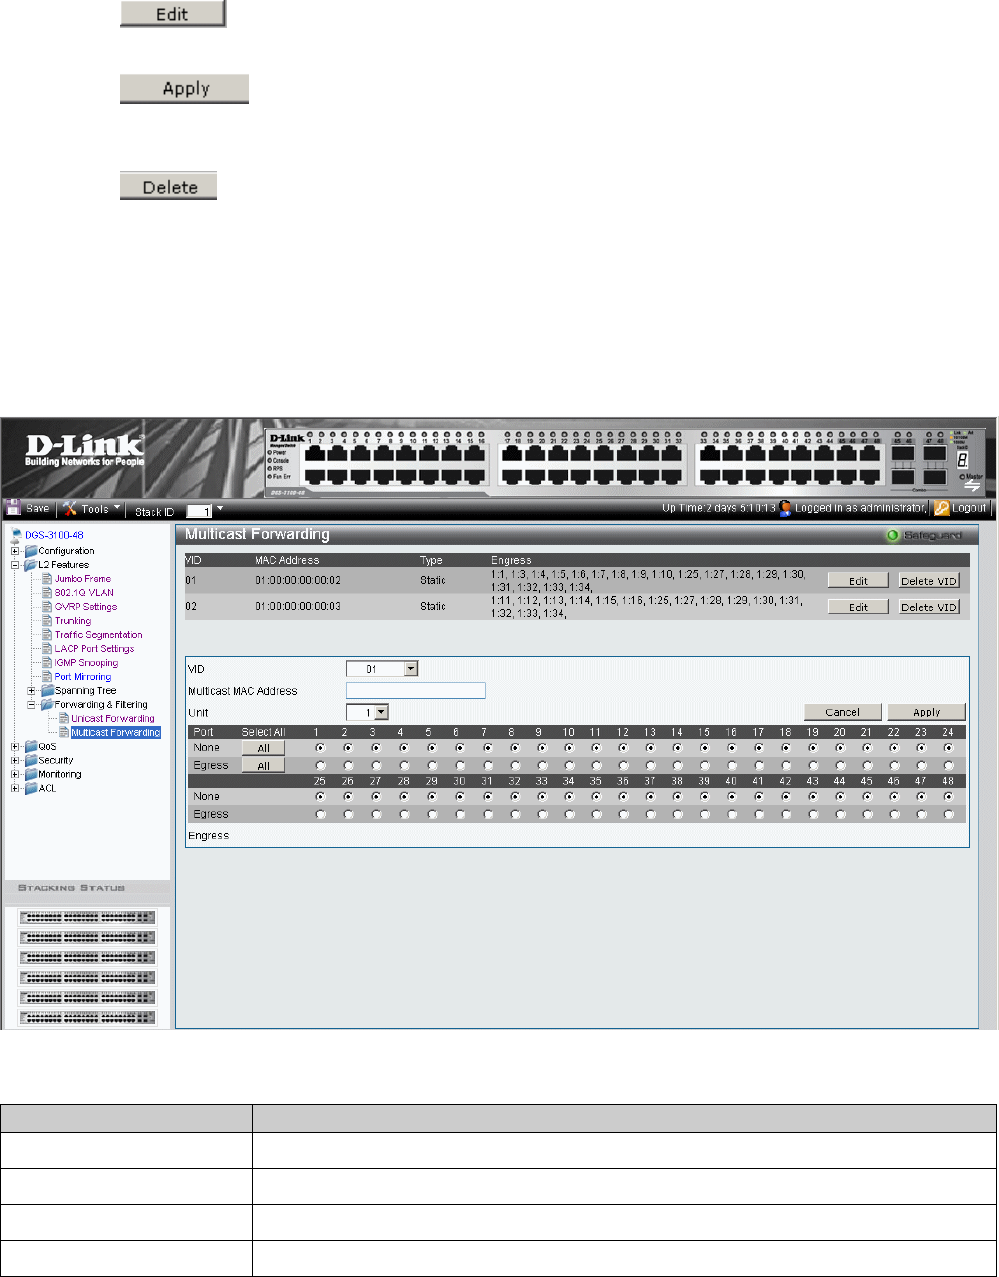 D-Link DGS-3100 Defining Multicast Forwarding